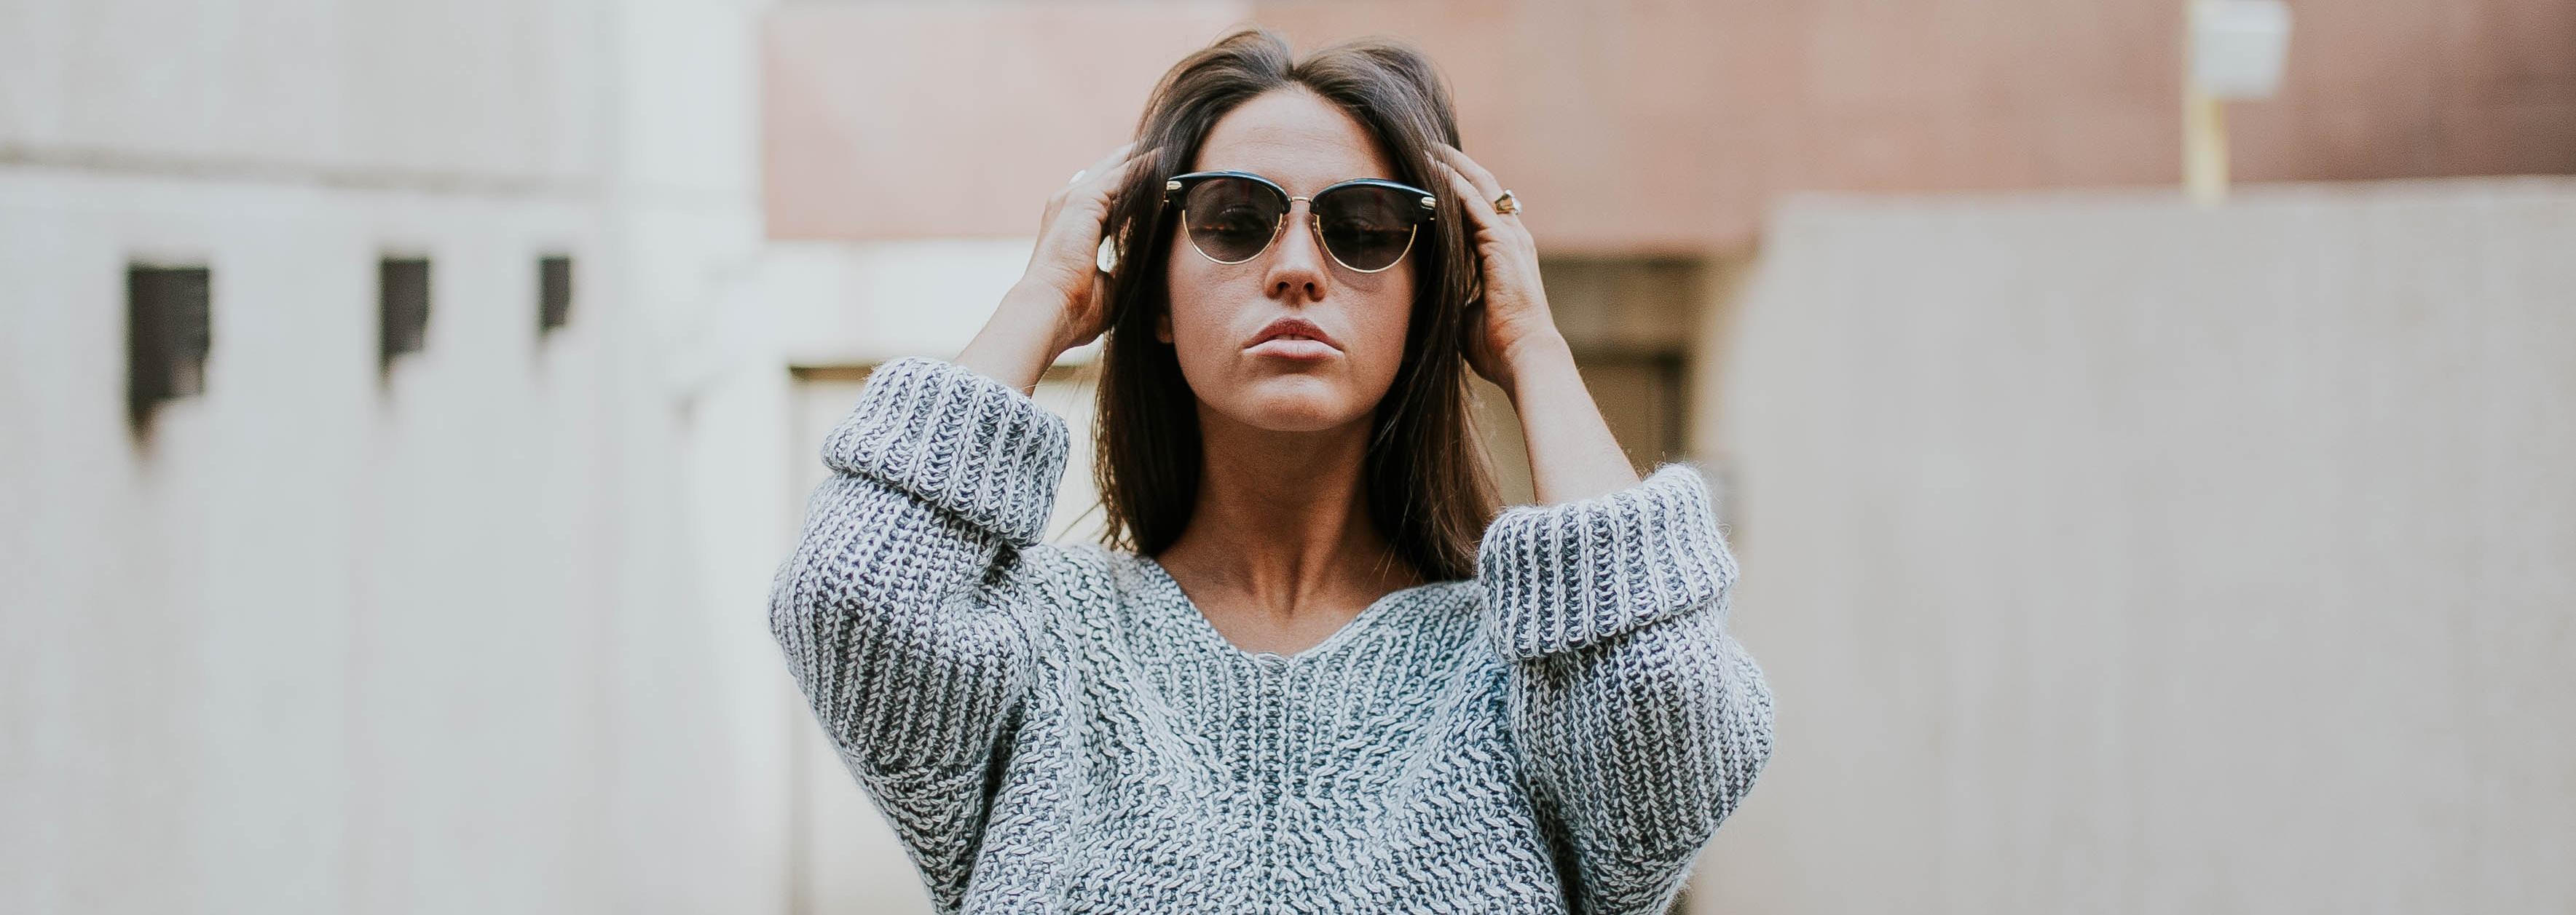 sunglasses wearing